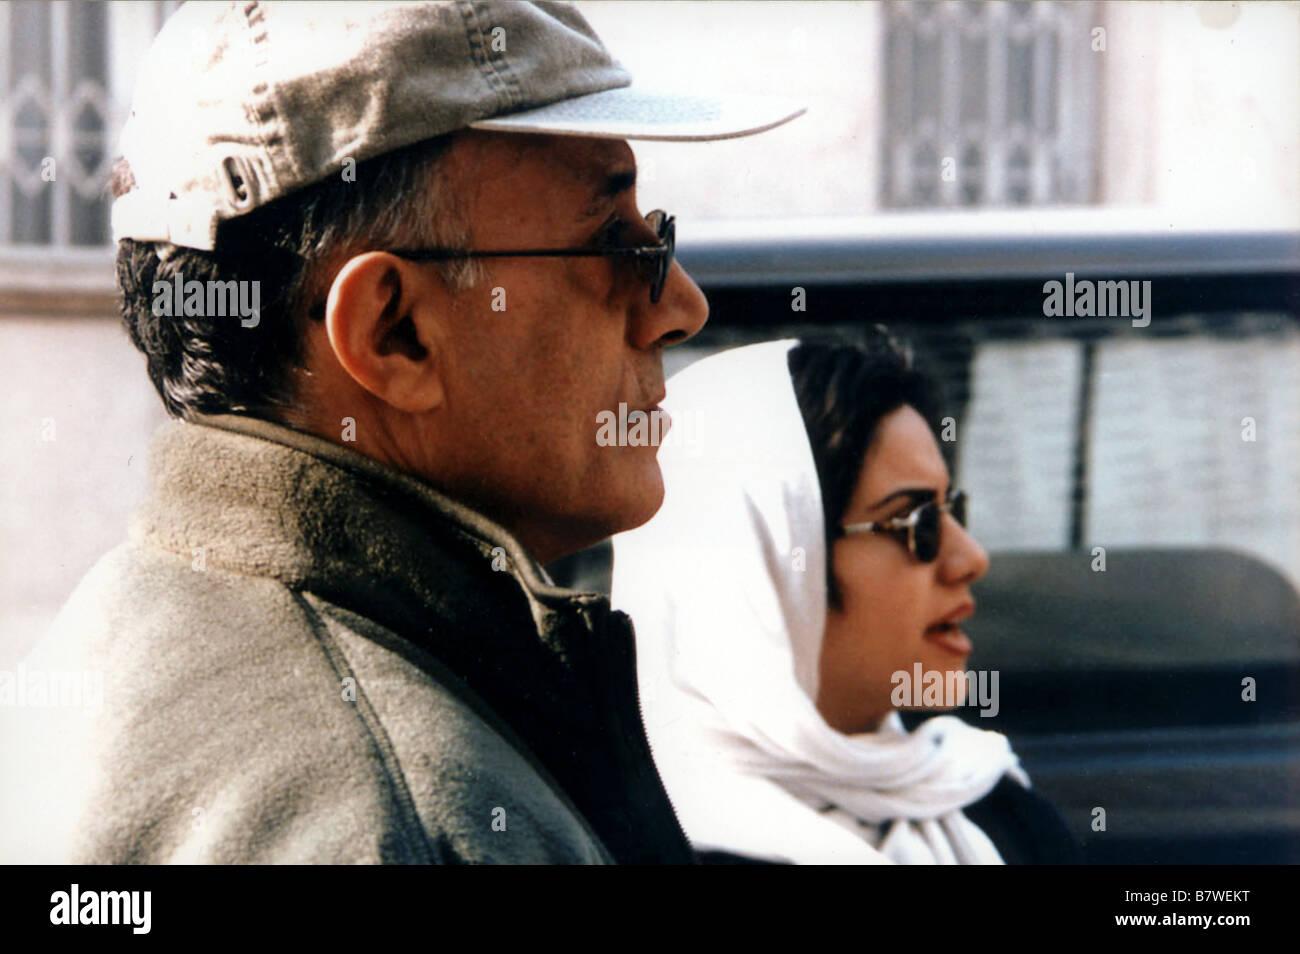 Ten Year: 2002 Iran Director: Abbas Kiarostami Abbas Kiarostami, Mania Akbari On the set - Stock Image